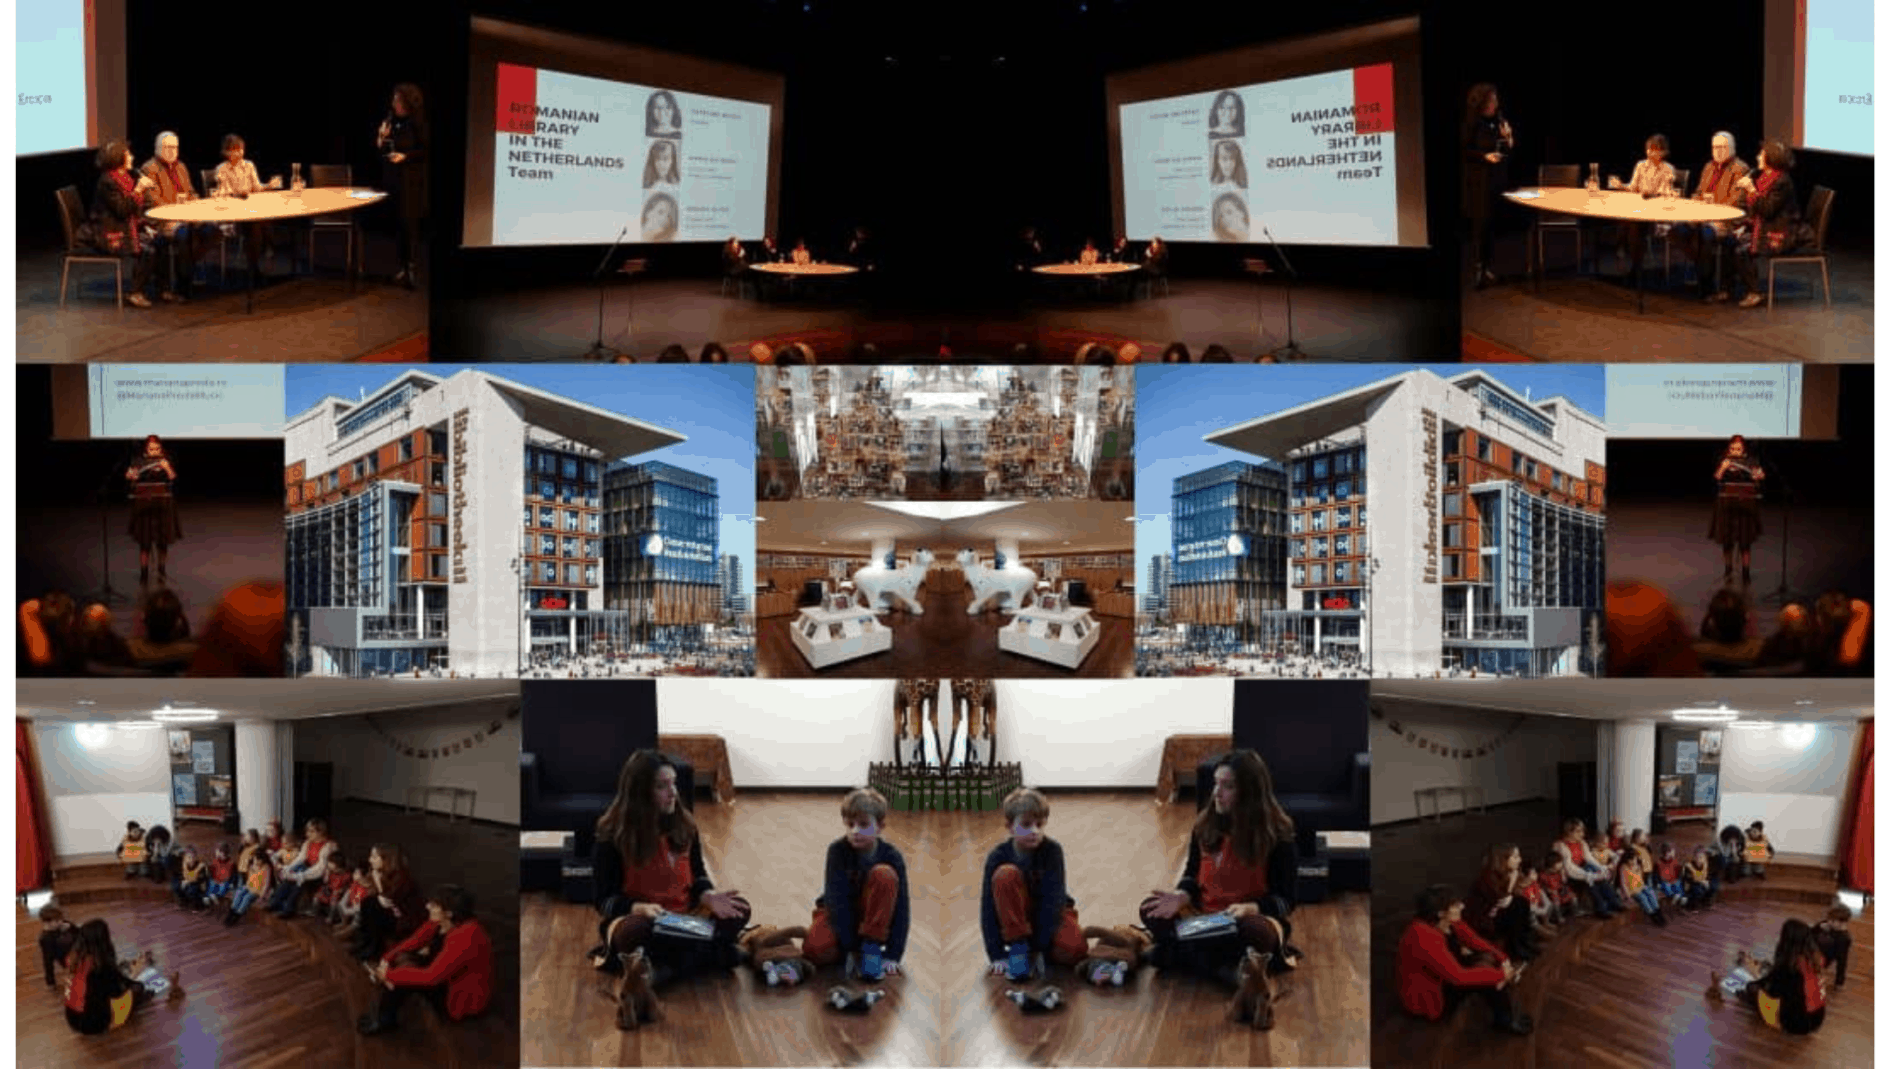 Inaugurarea bibliotecii românești din Amsterdam [impresii]